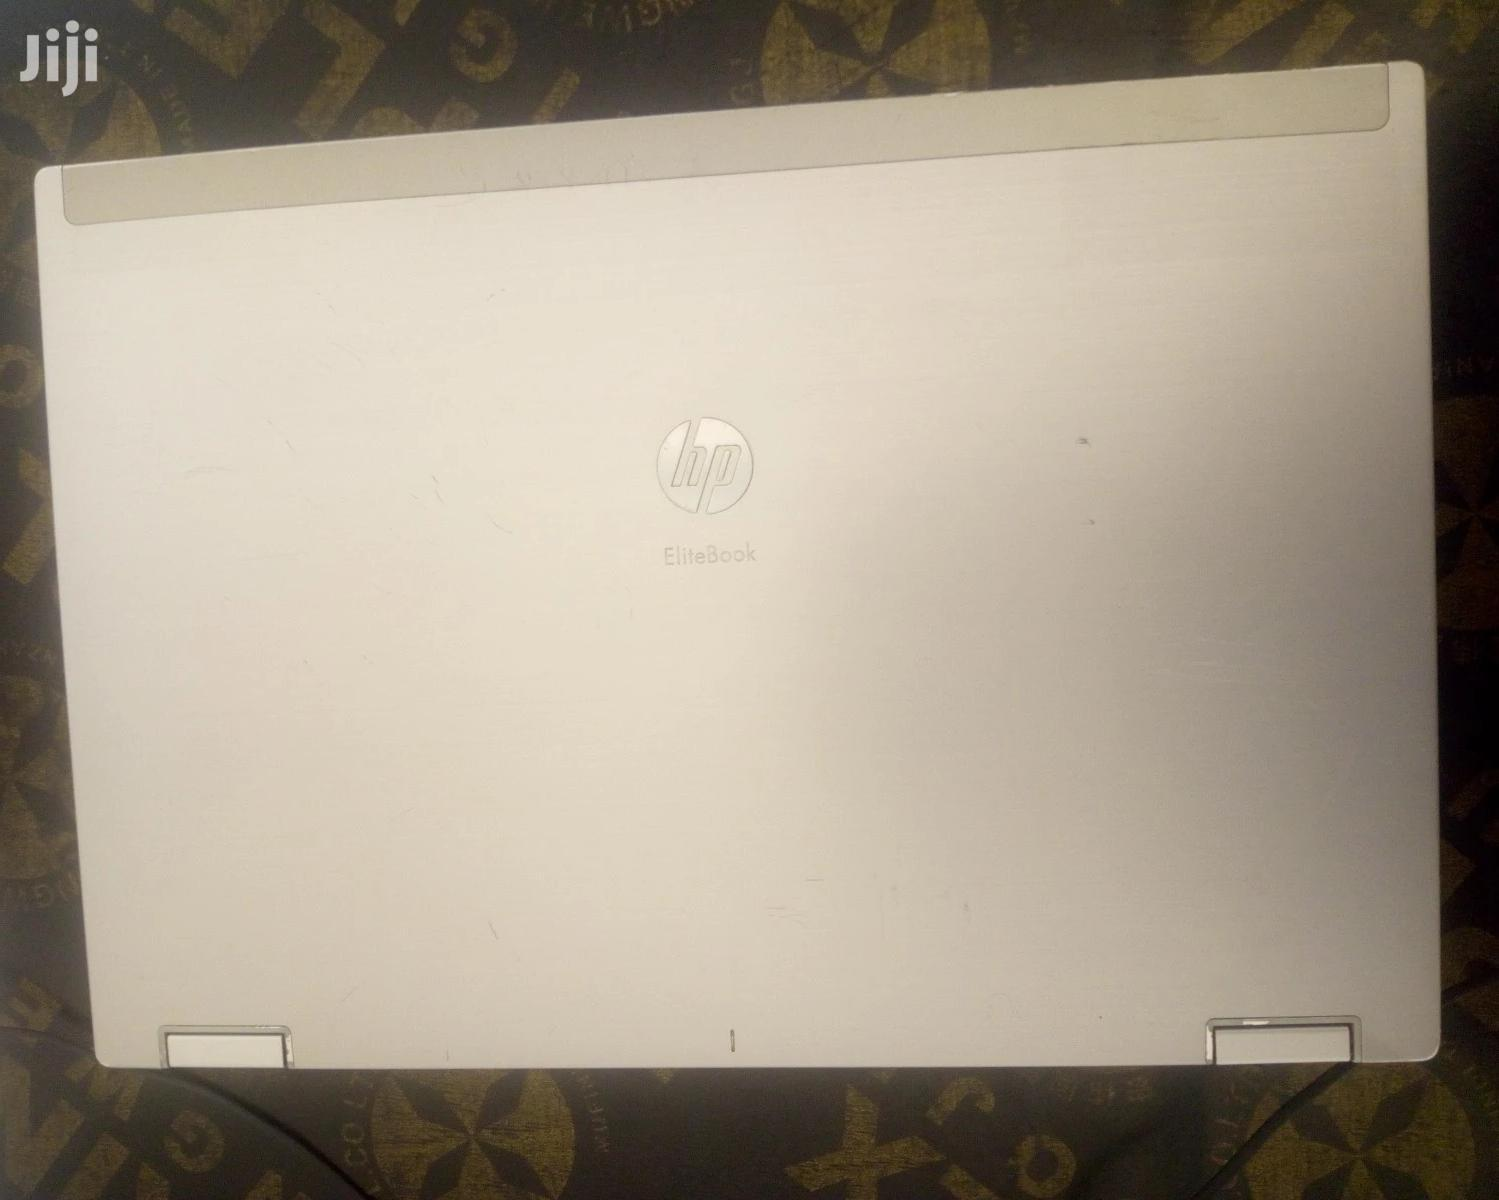 Laptop HP EliteBook 8440P 4GB Intel Core I5 HDD 320GB | Laptops & Computers for sale in Ilemela, Mwanza Region, Tanzania